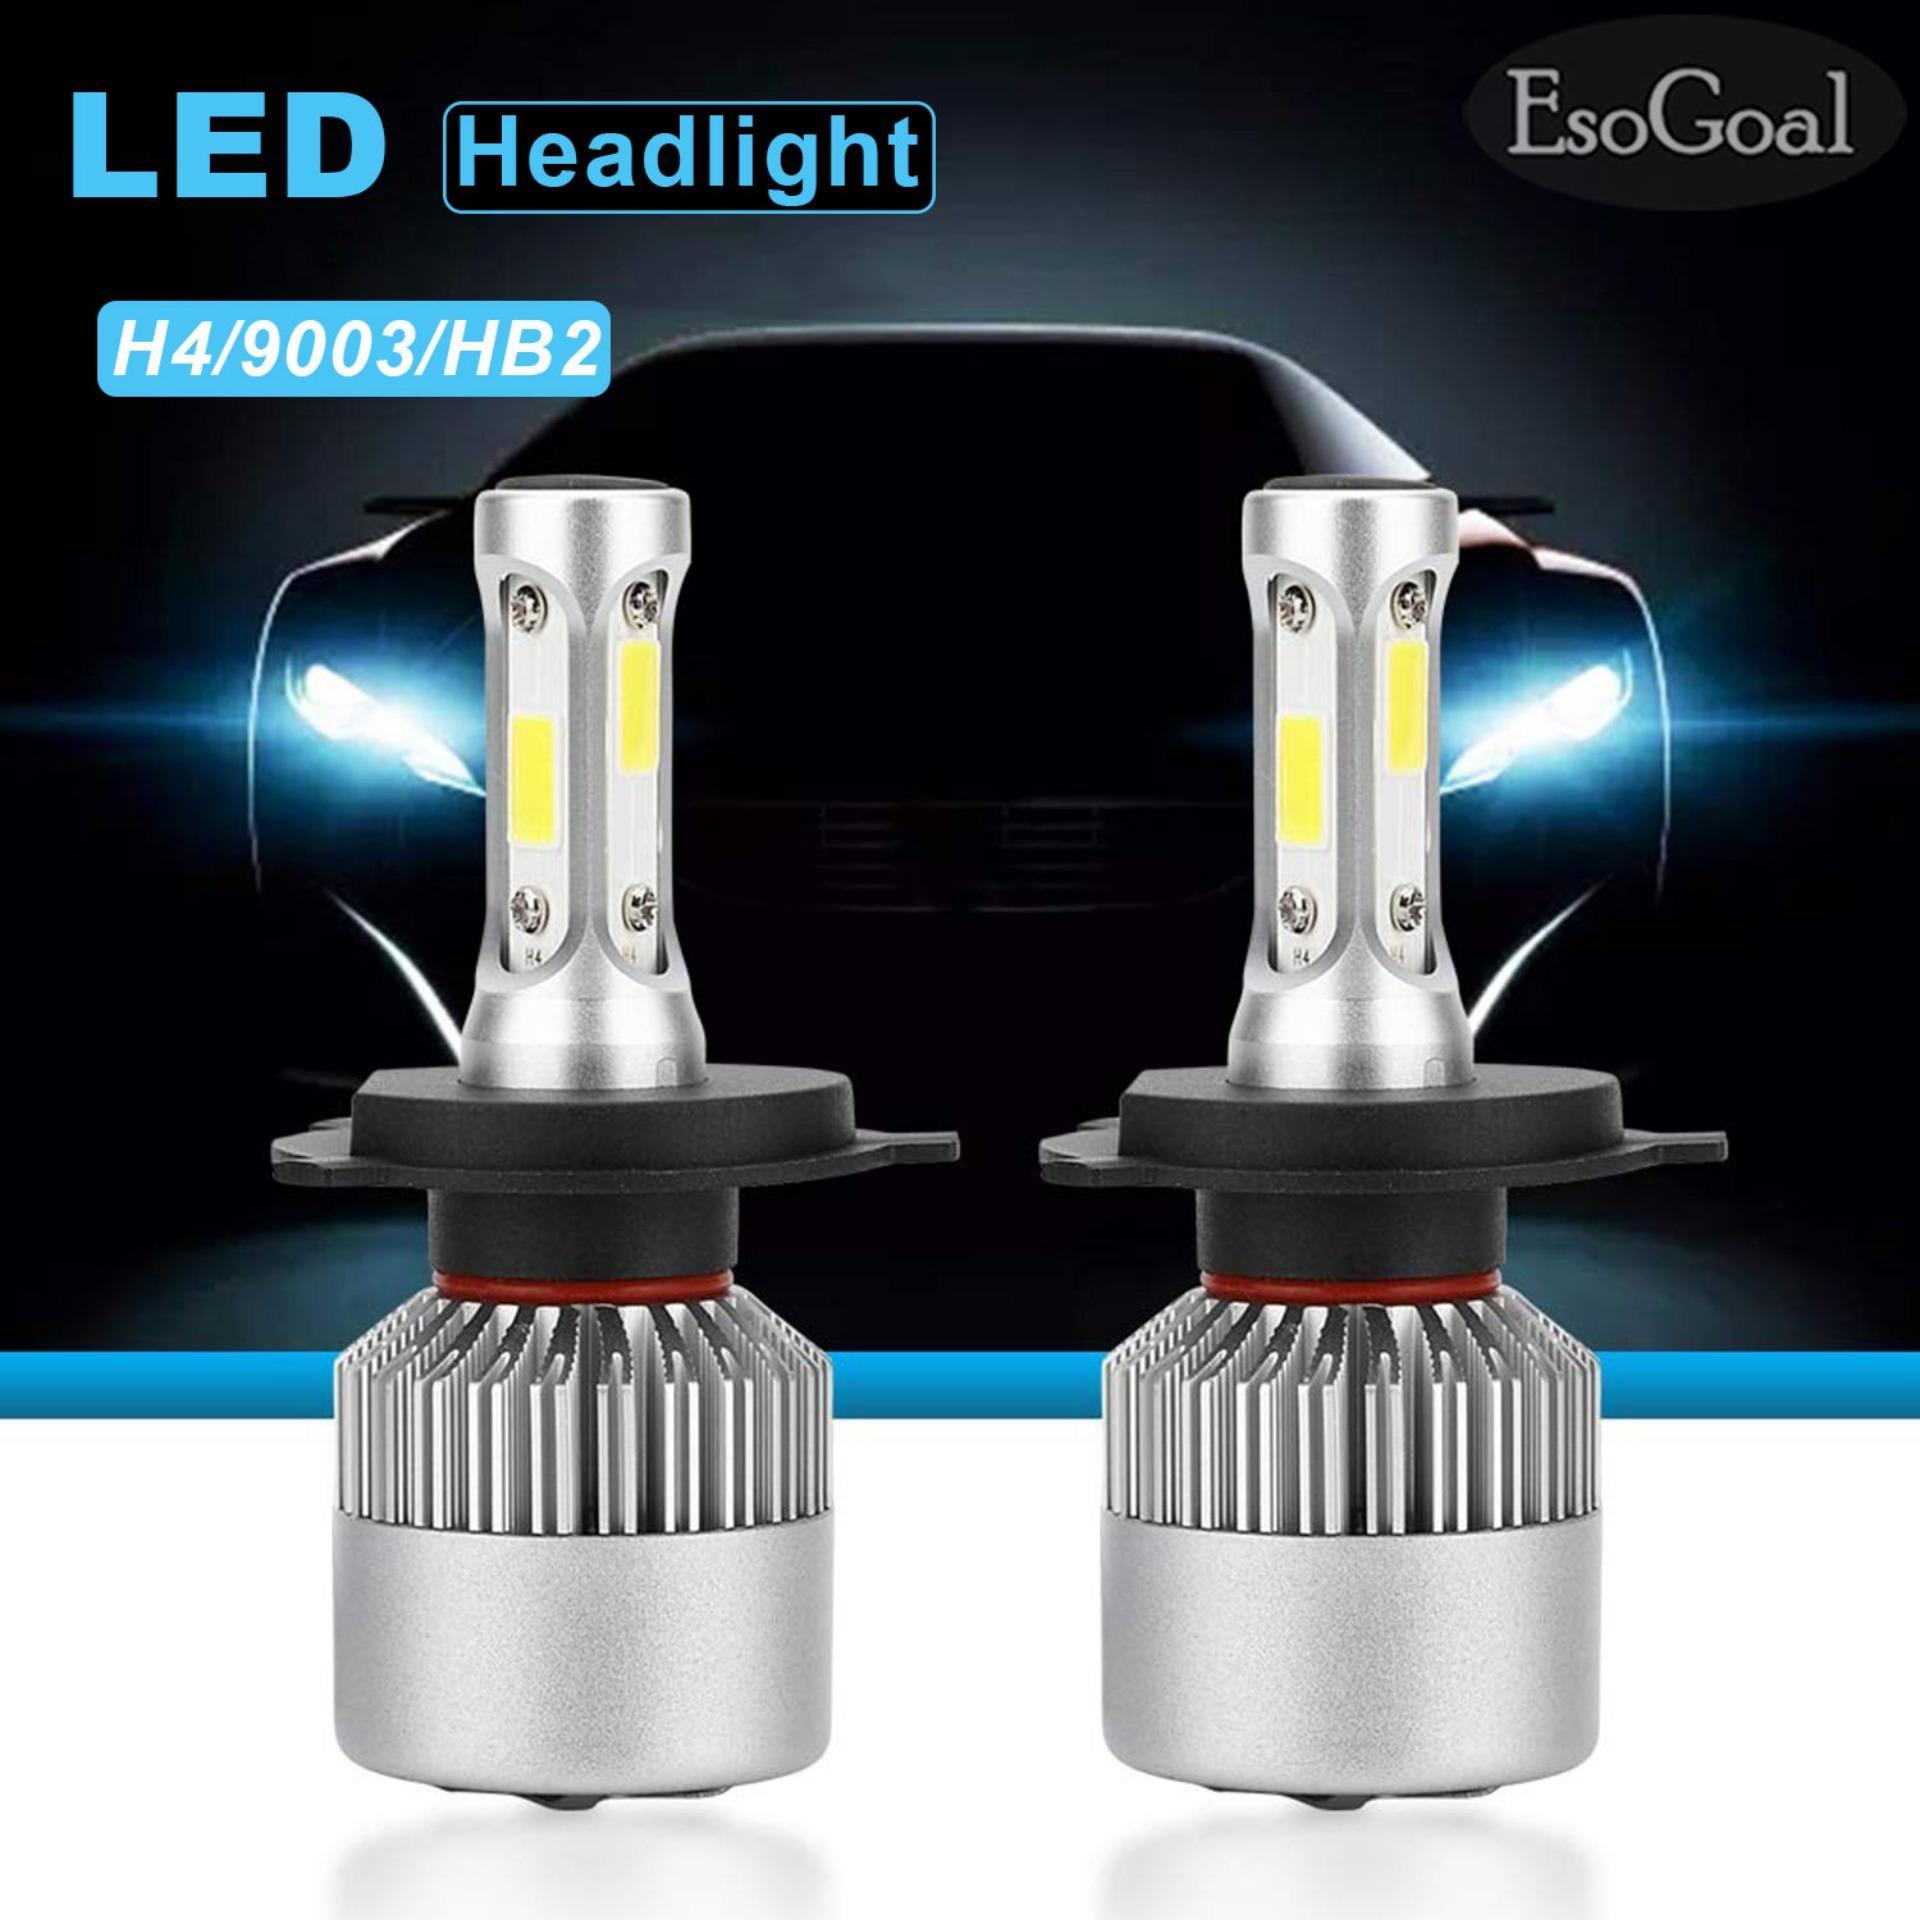 EsoGoal lampu led depan mobil 2 Pcs Automobile 8000LM LED Headlight Lamp Car Front Light 360 Beam Bulb Auto Head Light H4/HB2/9003